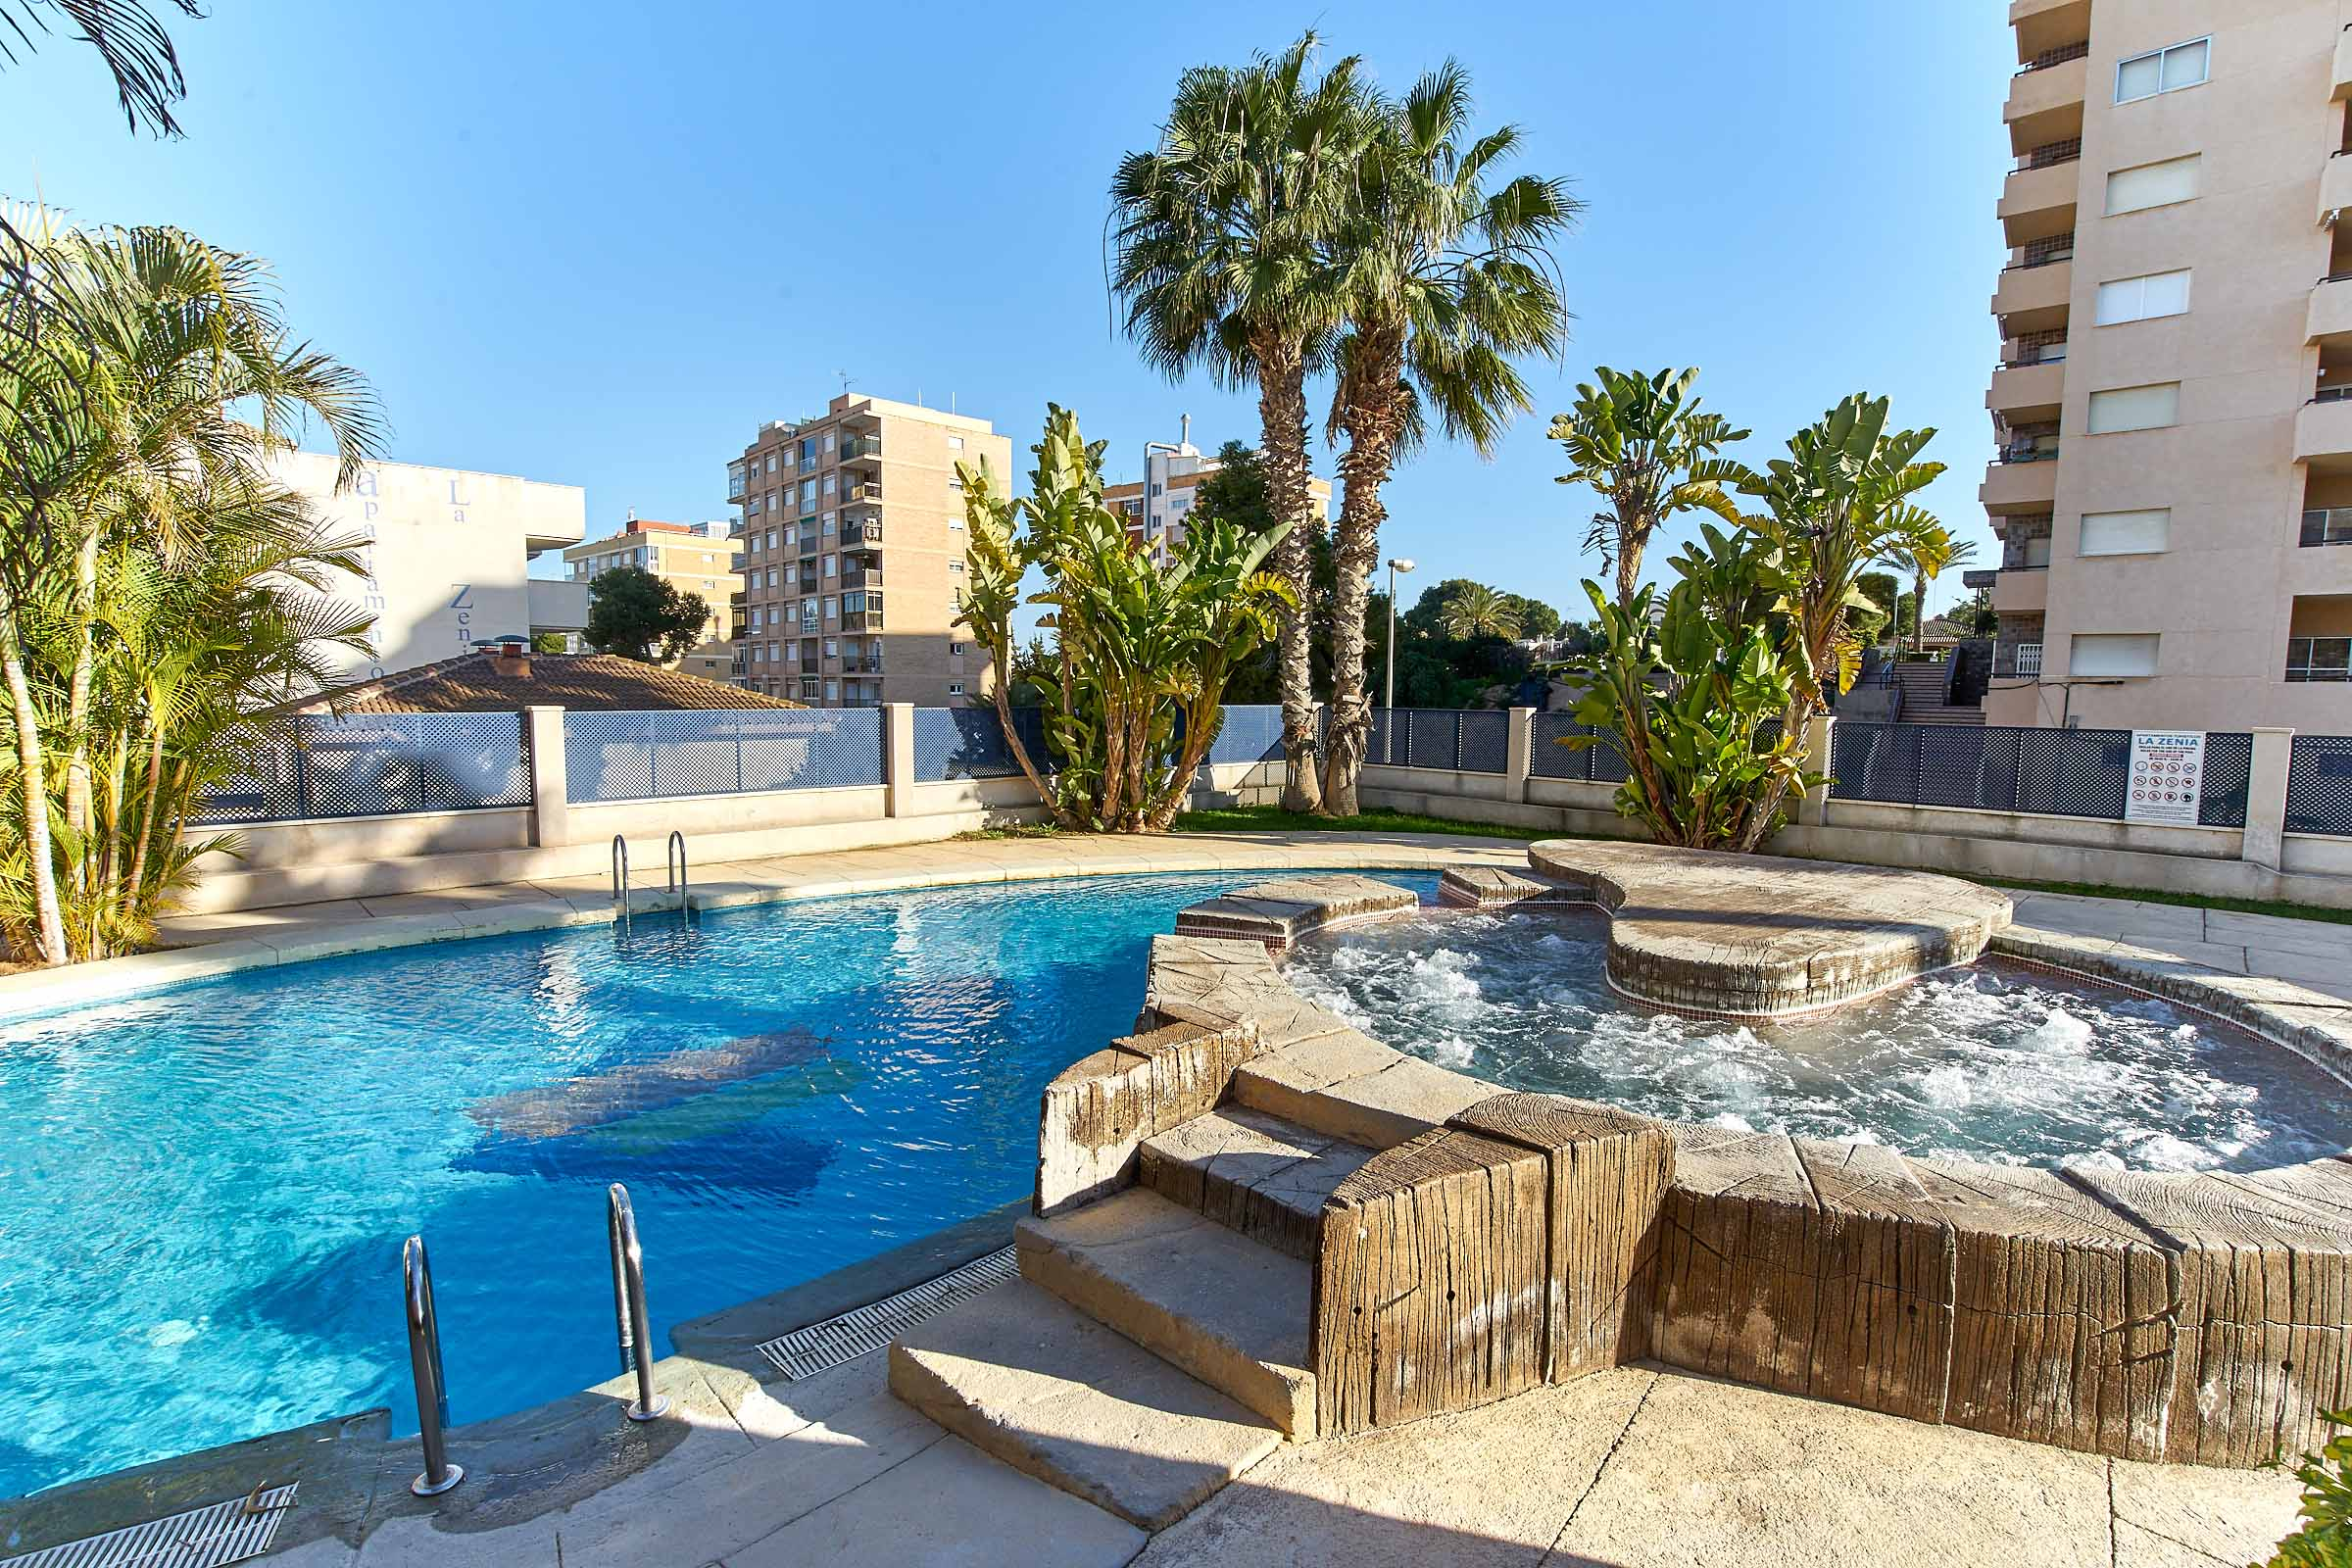 Apartment Espanhouse La Zenia 109 photo 20450307